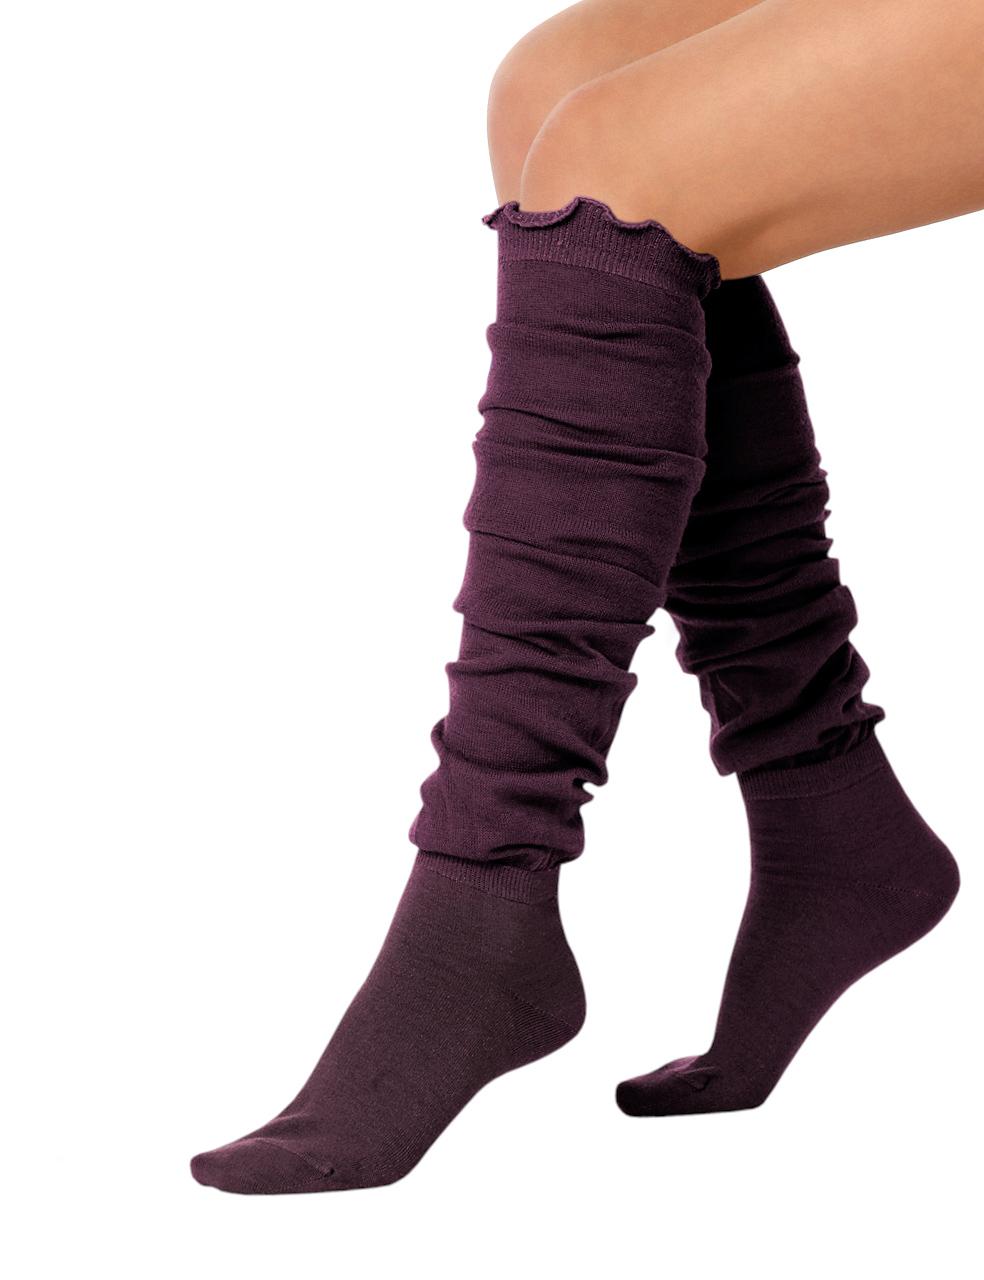 Фото женских ног носки 17 фотография